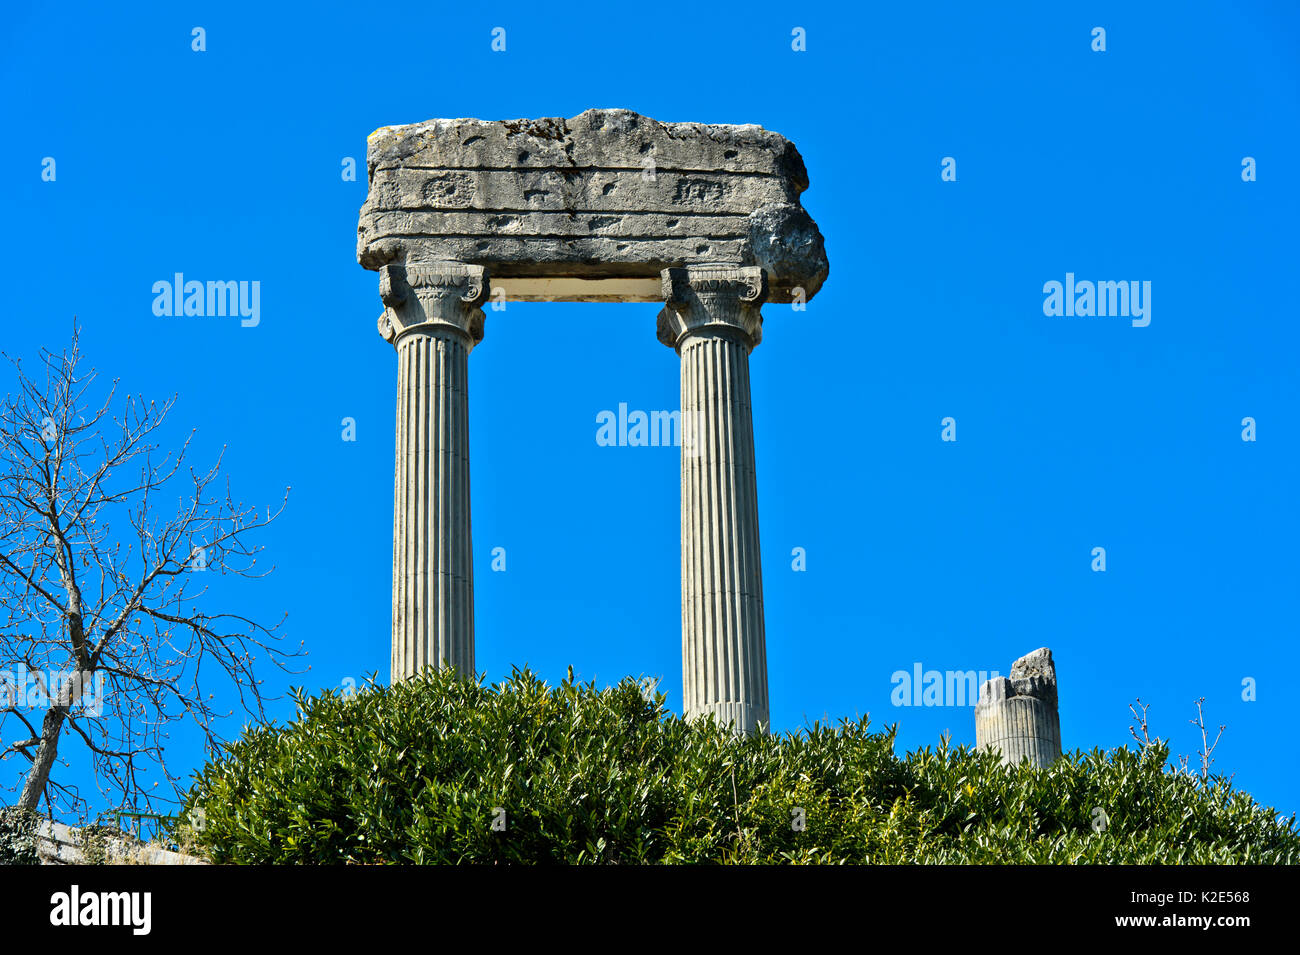 Corinthian columns from Noviodunum Helvetiorum, Nyon, Vaud, Switzerland - Stock Image